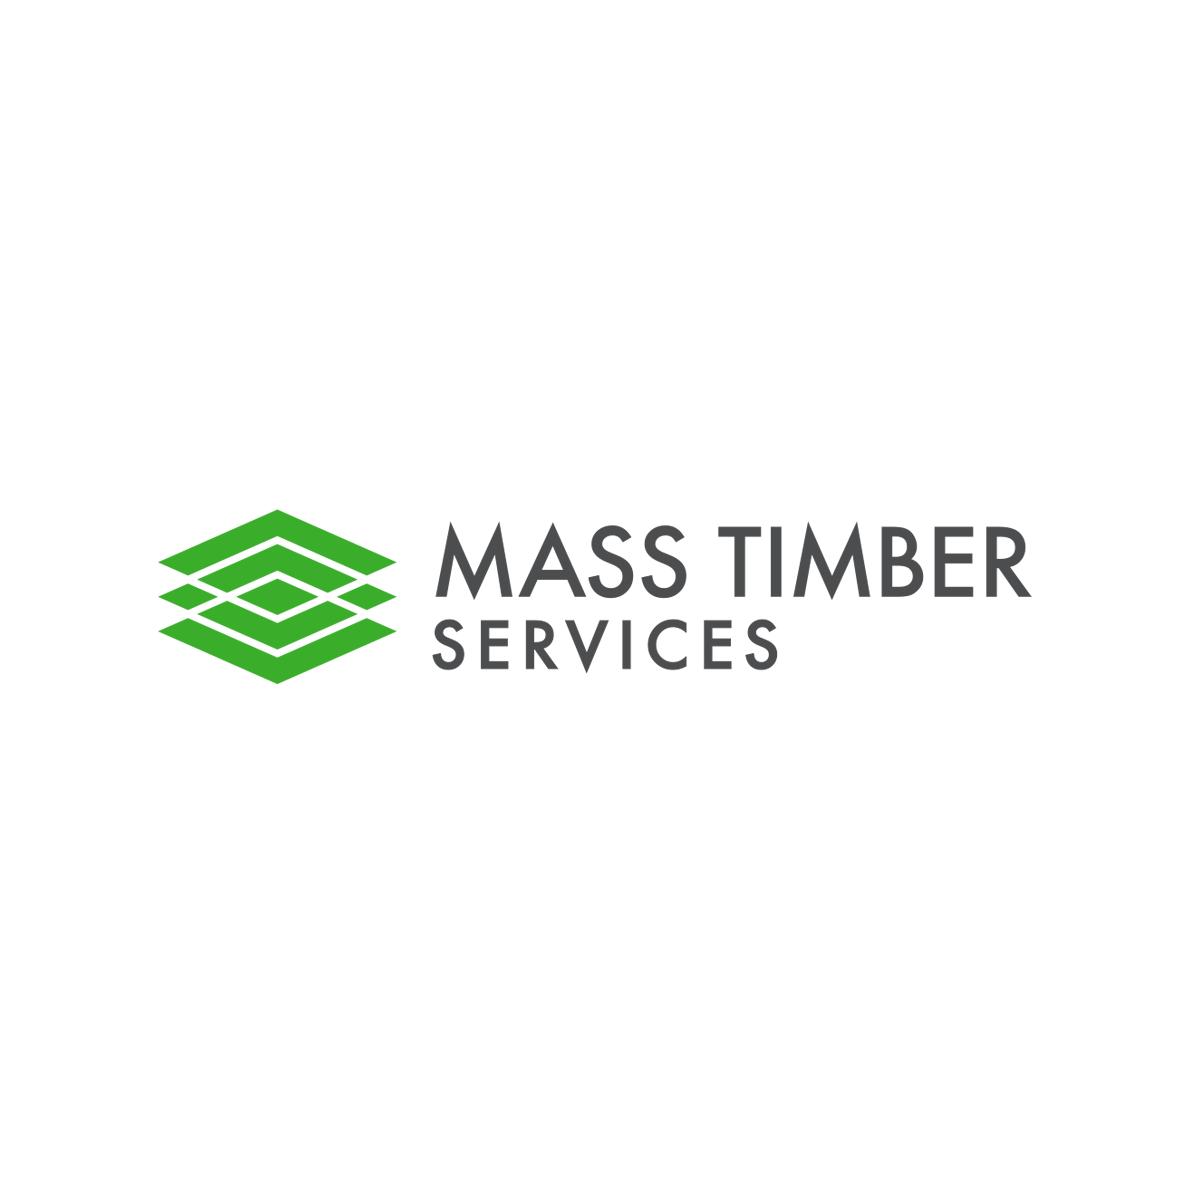 Mass Timber Services logo